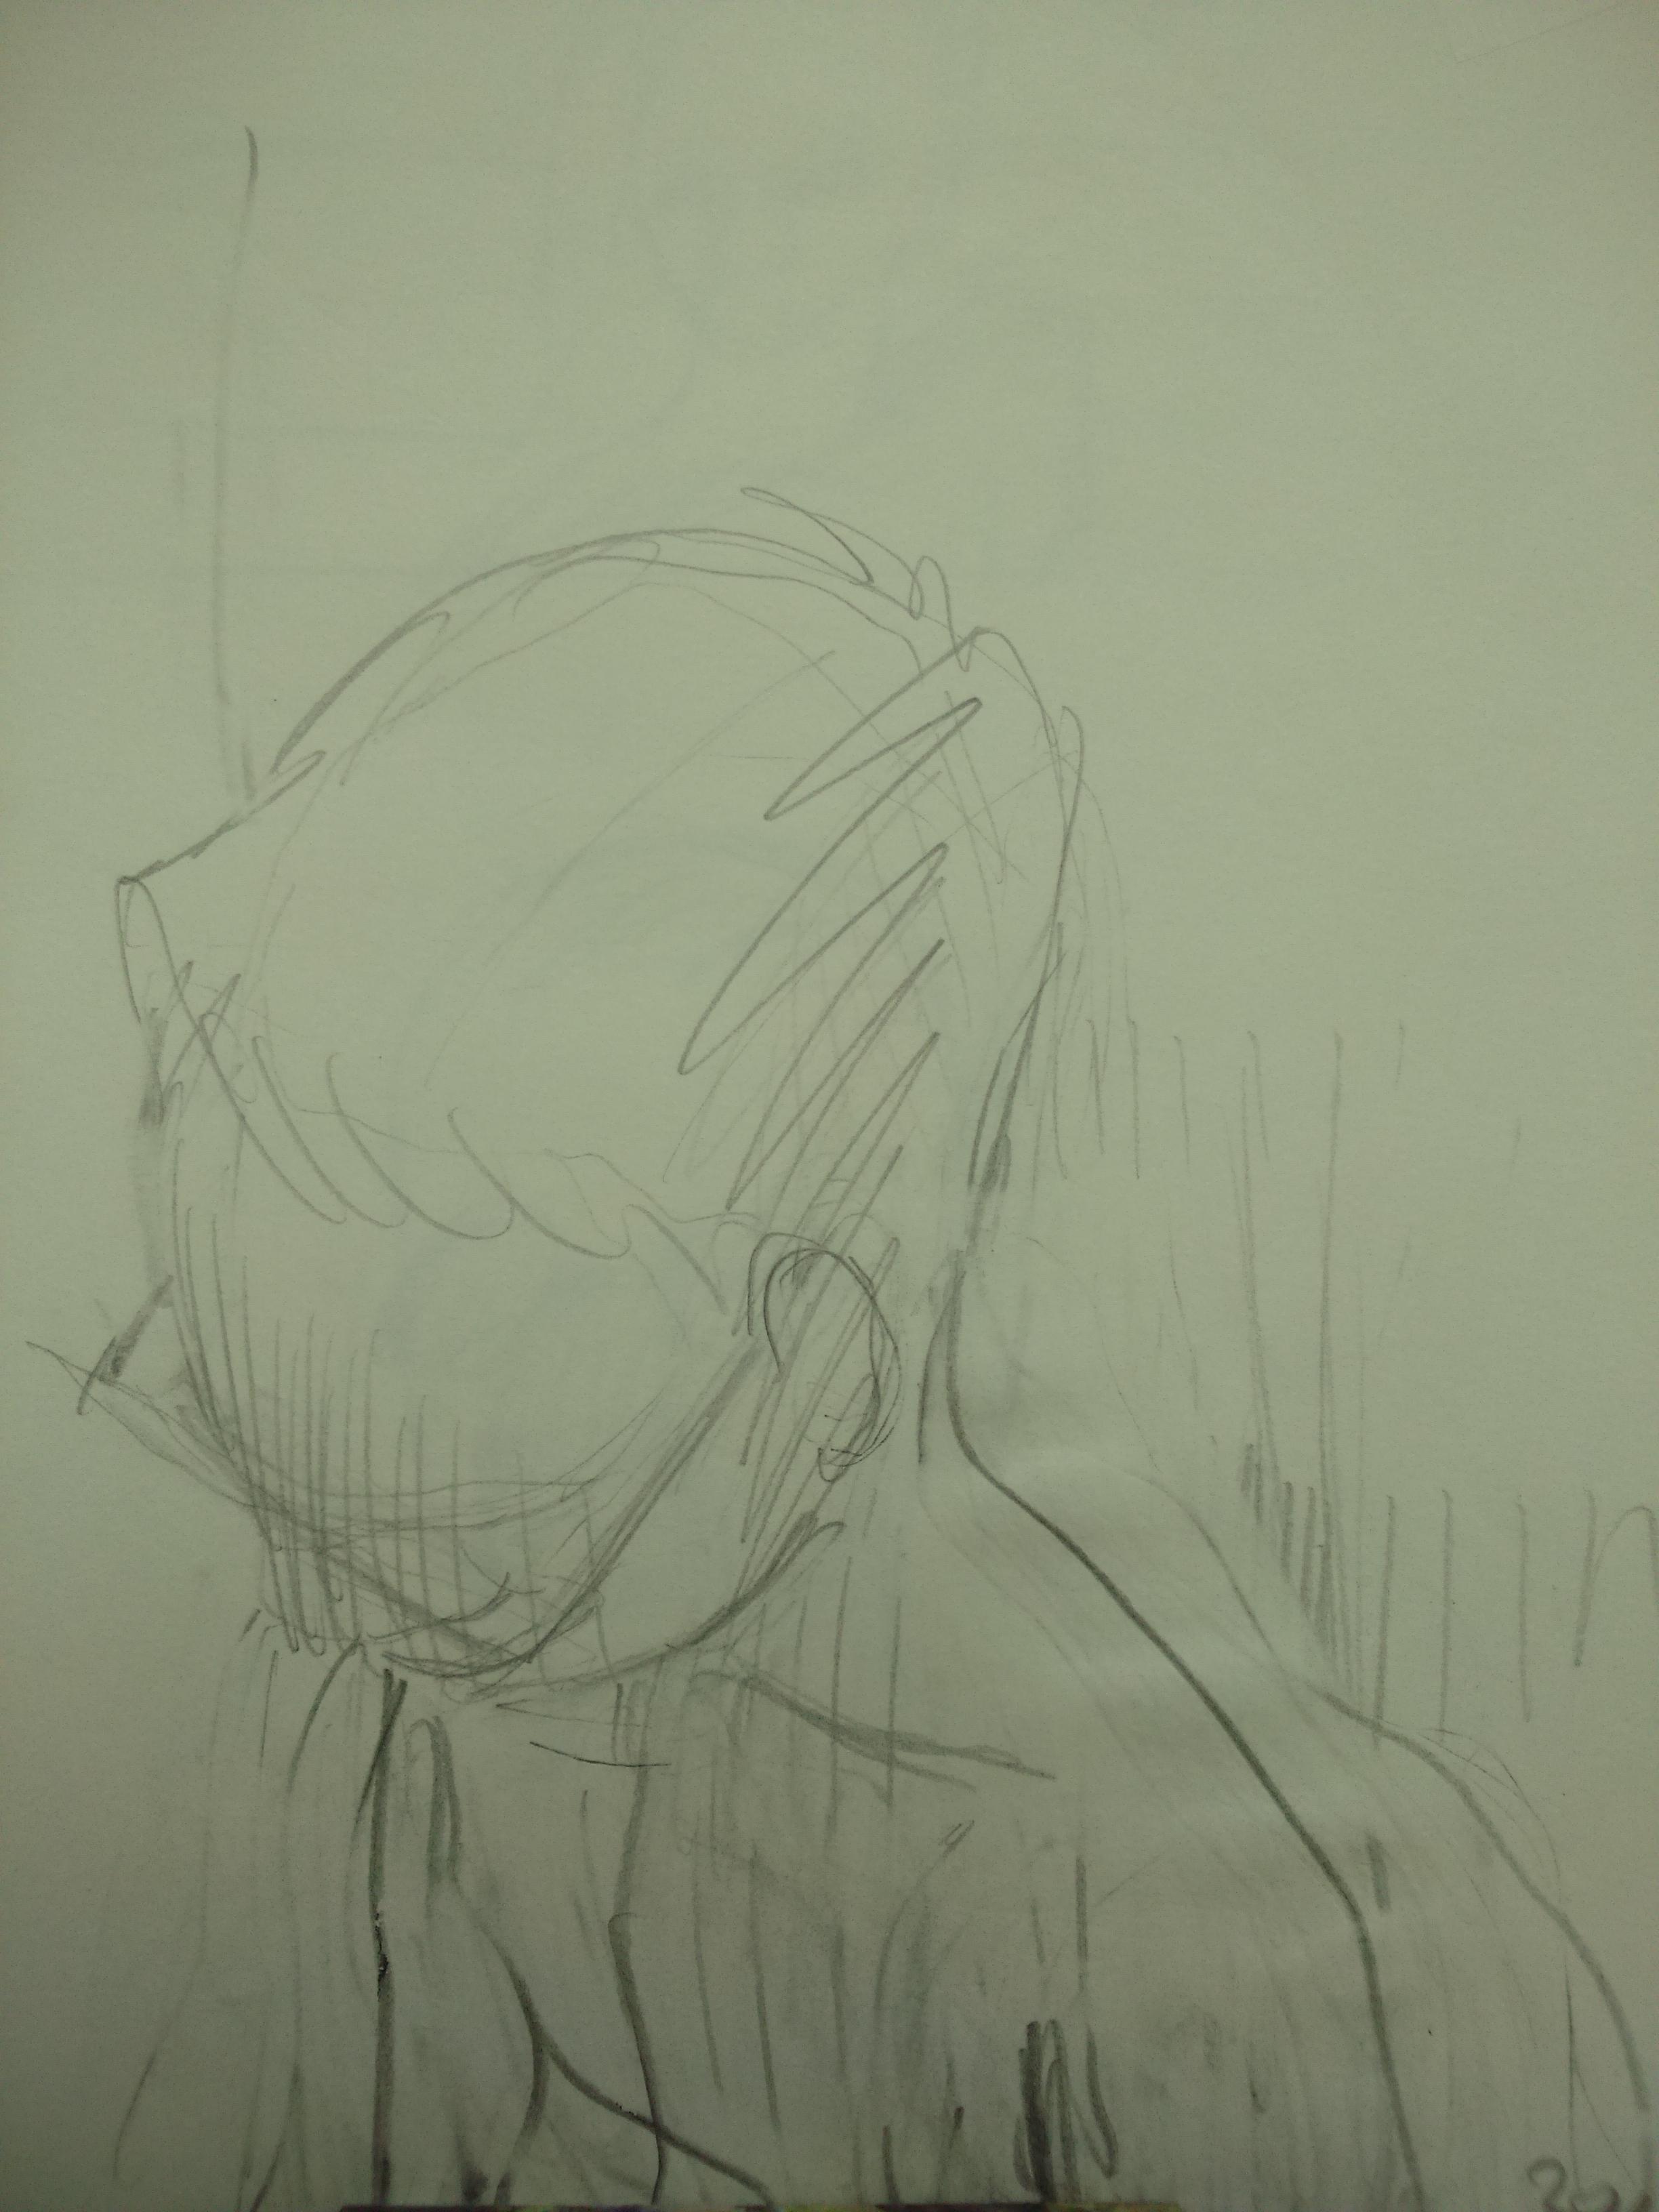 BENARD_Jeune_garçon_2014.crayon_graphite.21x29,7.JPG